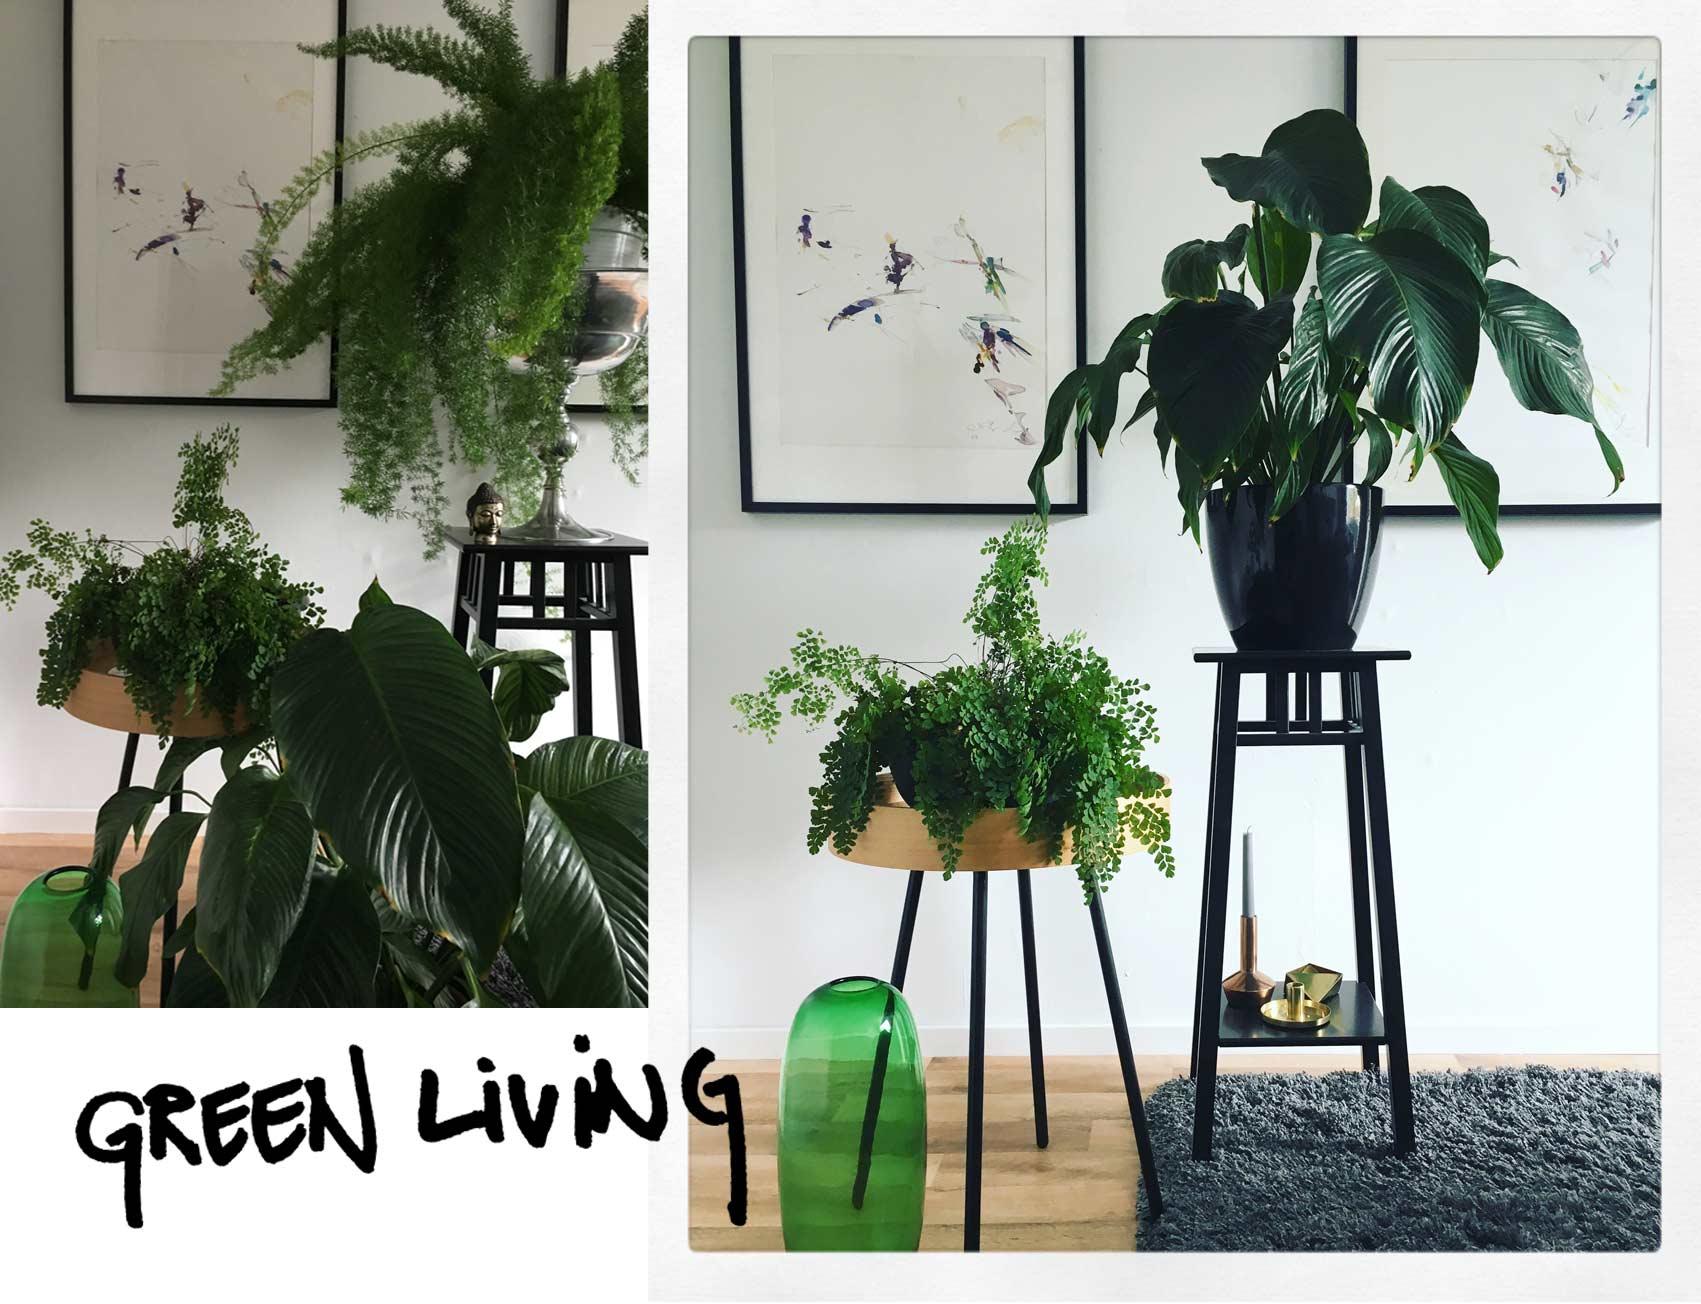 mokowo interiorblog greenliving mokowo. Black Bedroom Furniture Sets. Home Design Ideas